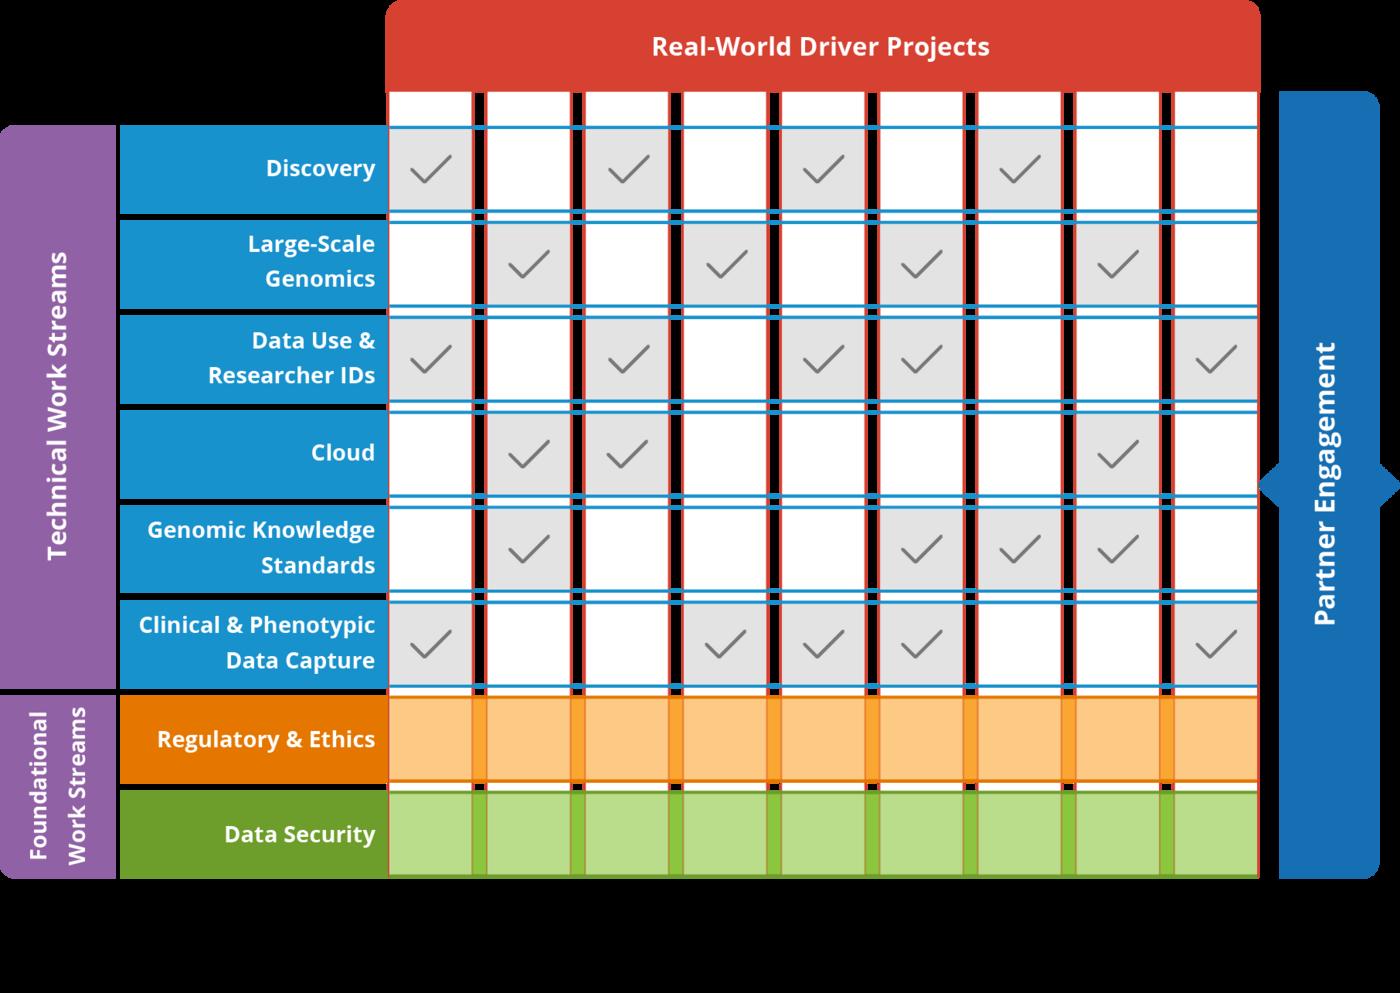 https://www.ga4gh.org/wp-content/uploads/GA4GH-how-we-work-diagram.png